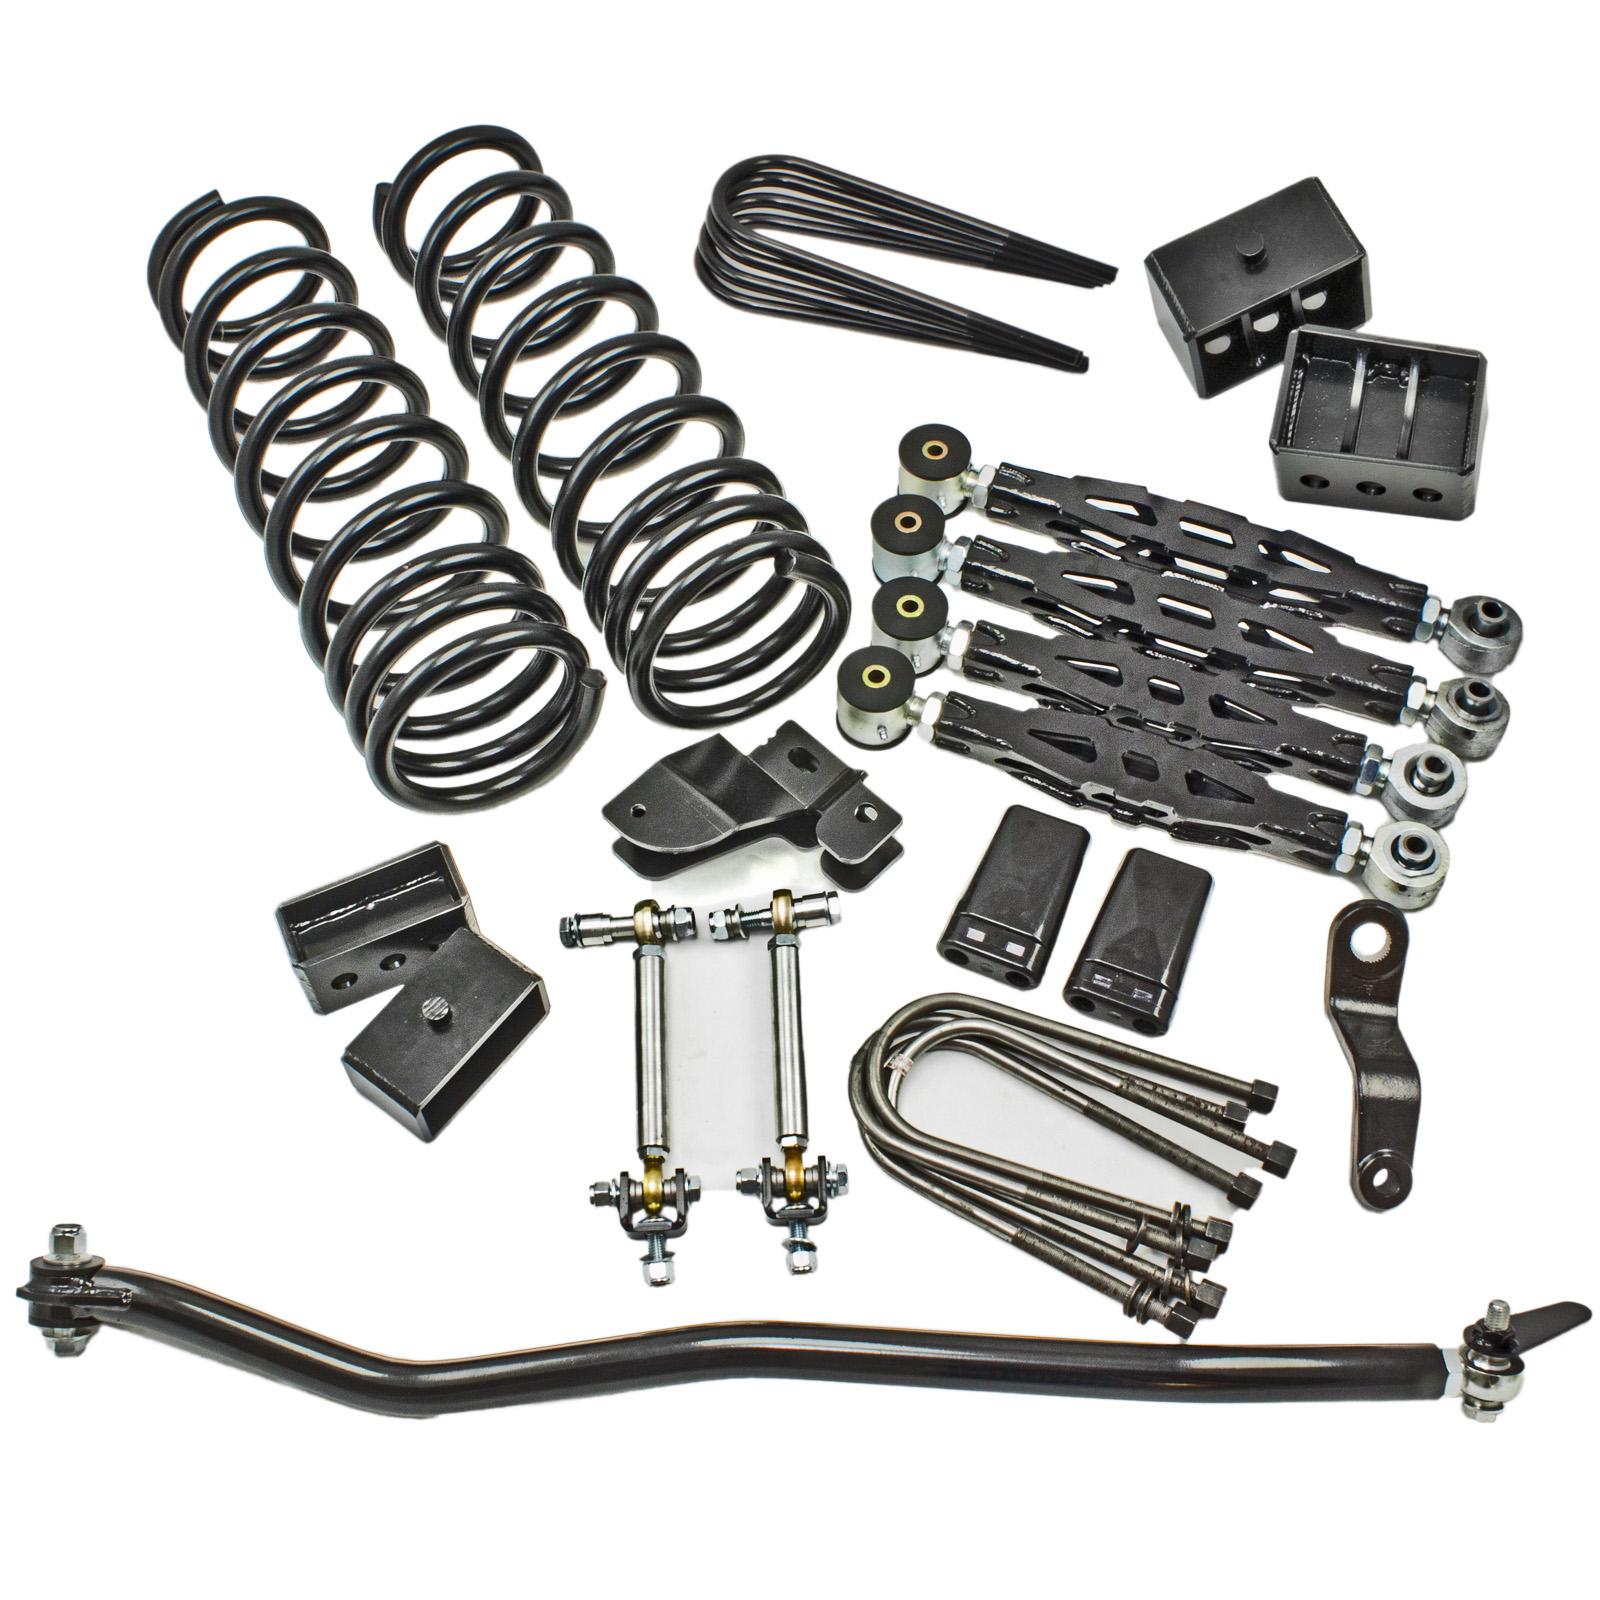 Dodge Lift Kit For 2011 Dodge Ram 3500 Truck Lift Kits